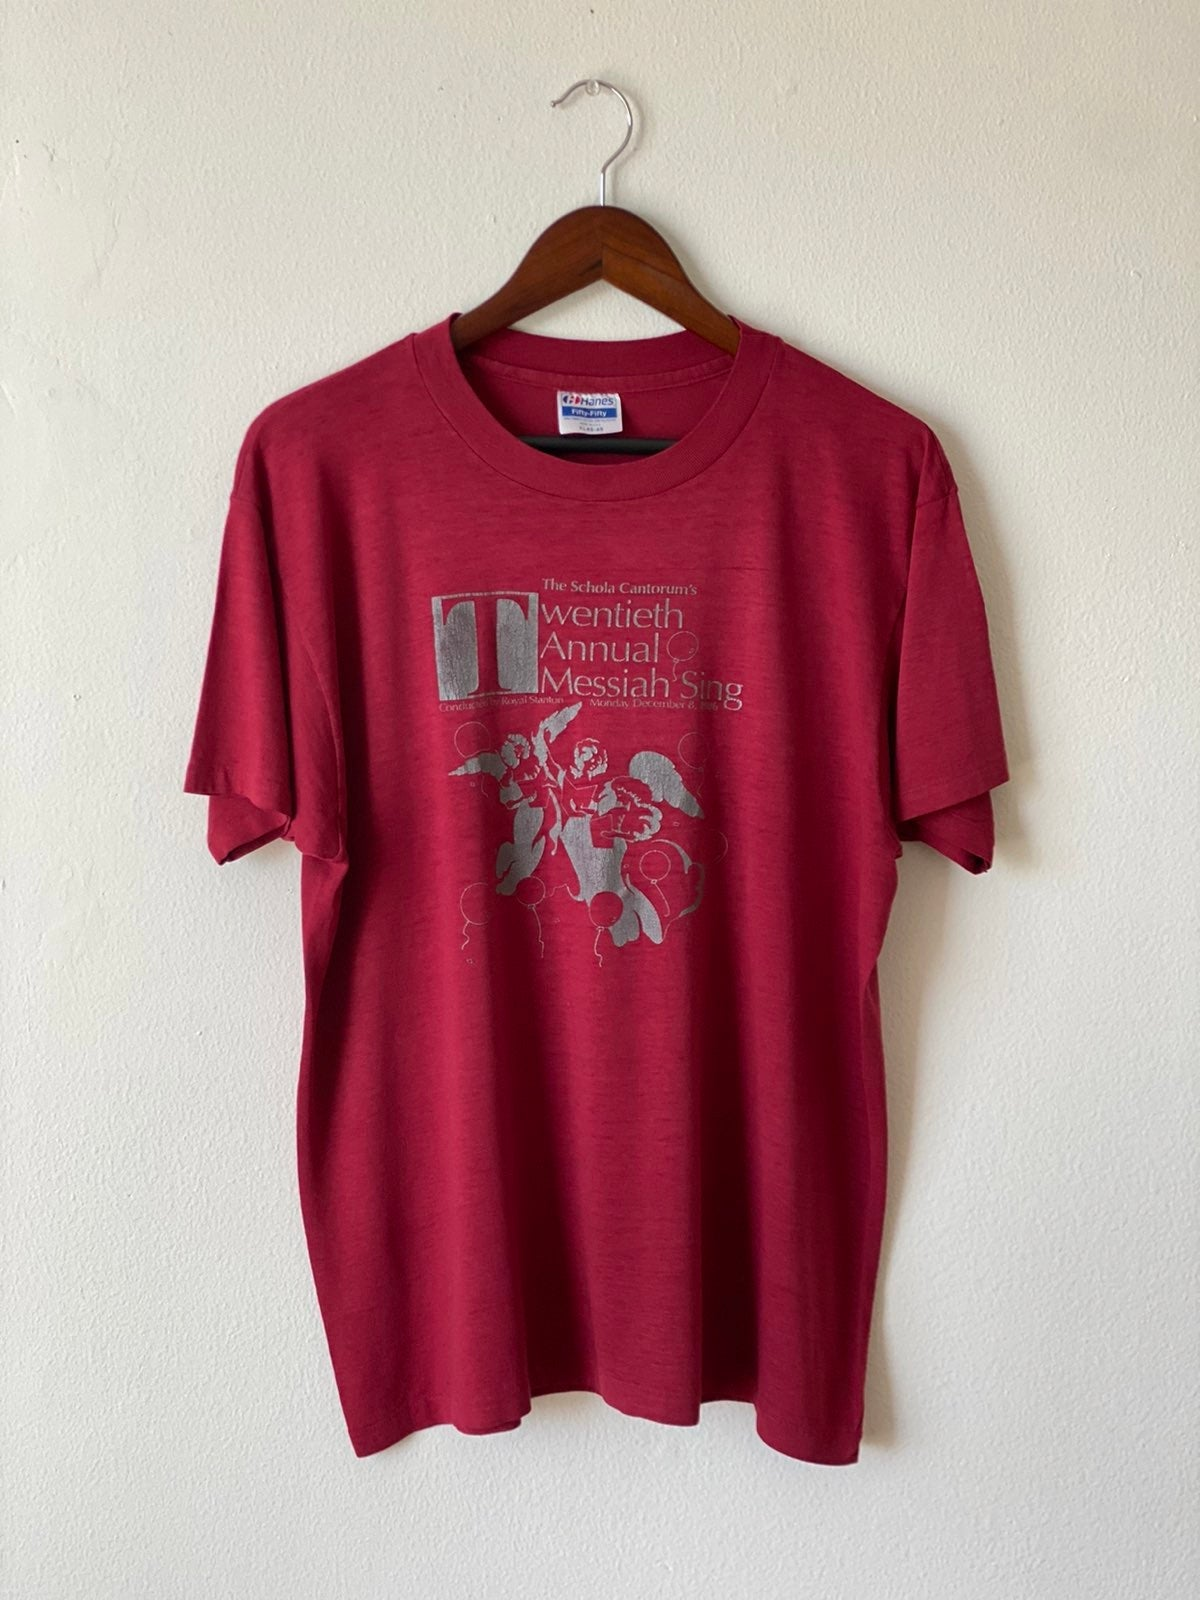 Vtg 80s Single Stitch Messiah Sing Shirt